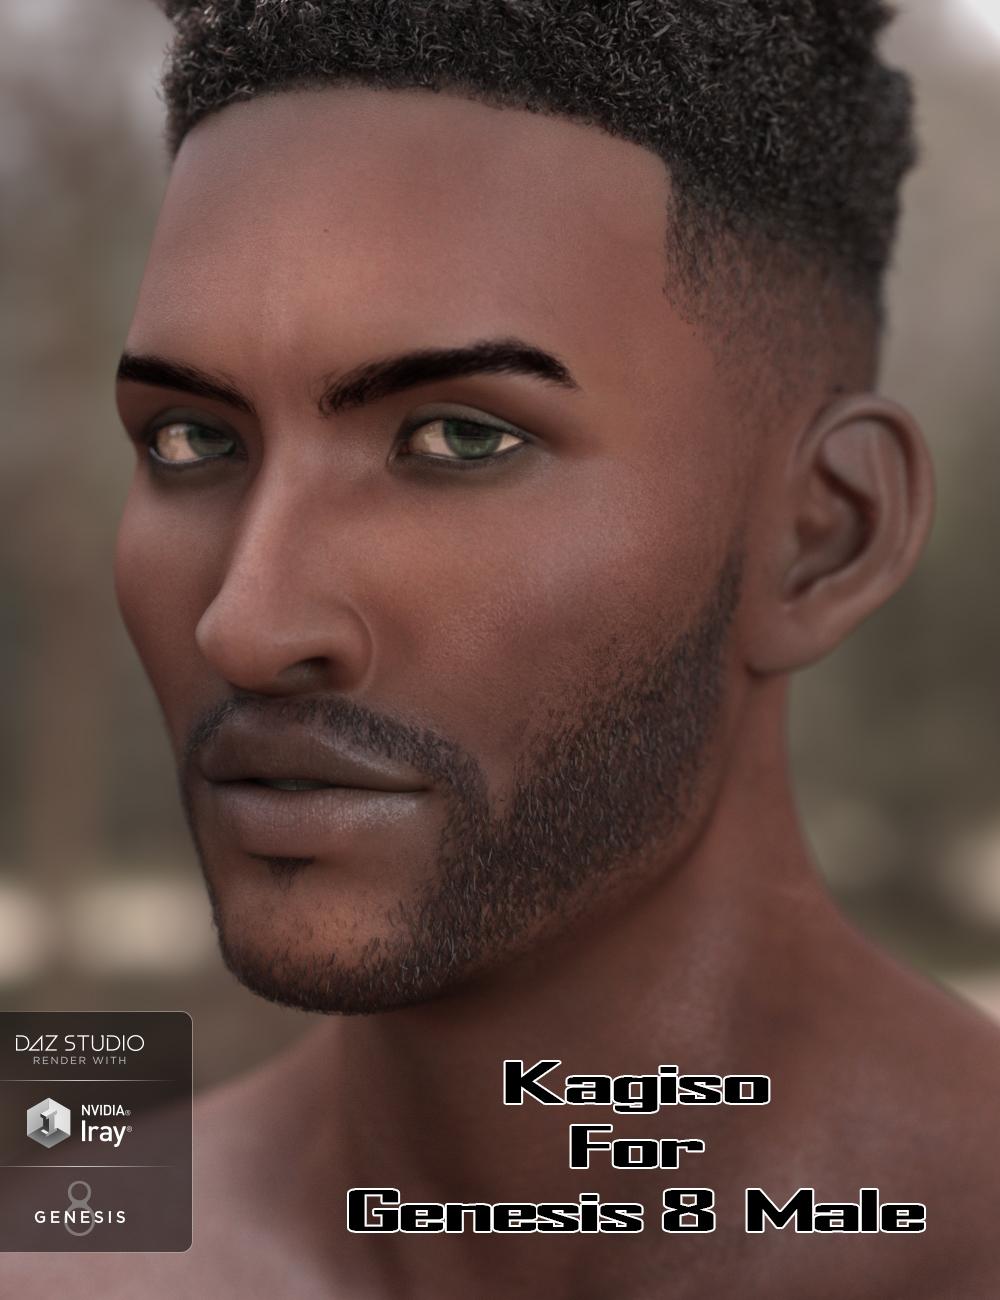 Kagiso for Genesis 8 Male by: JavierMicheal, 3D Models by Daz 3D